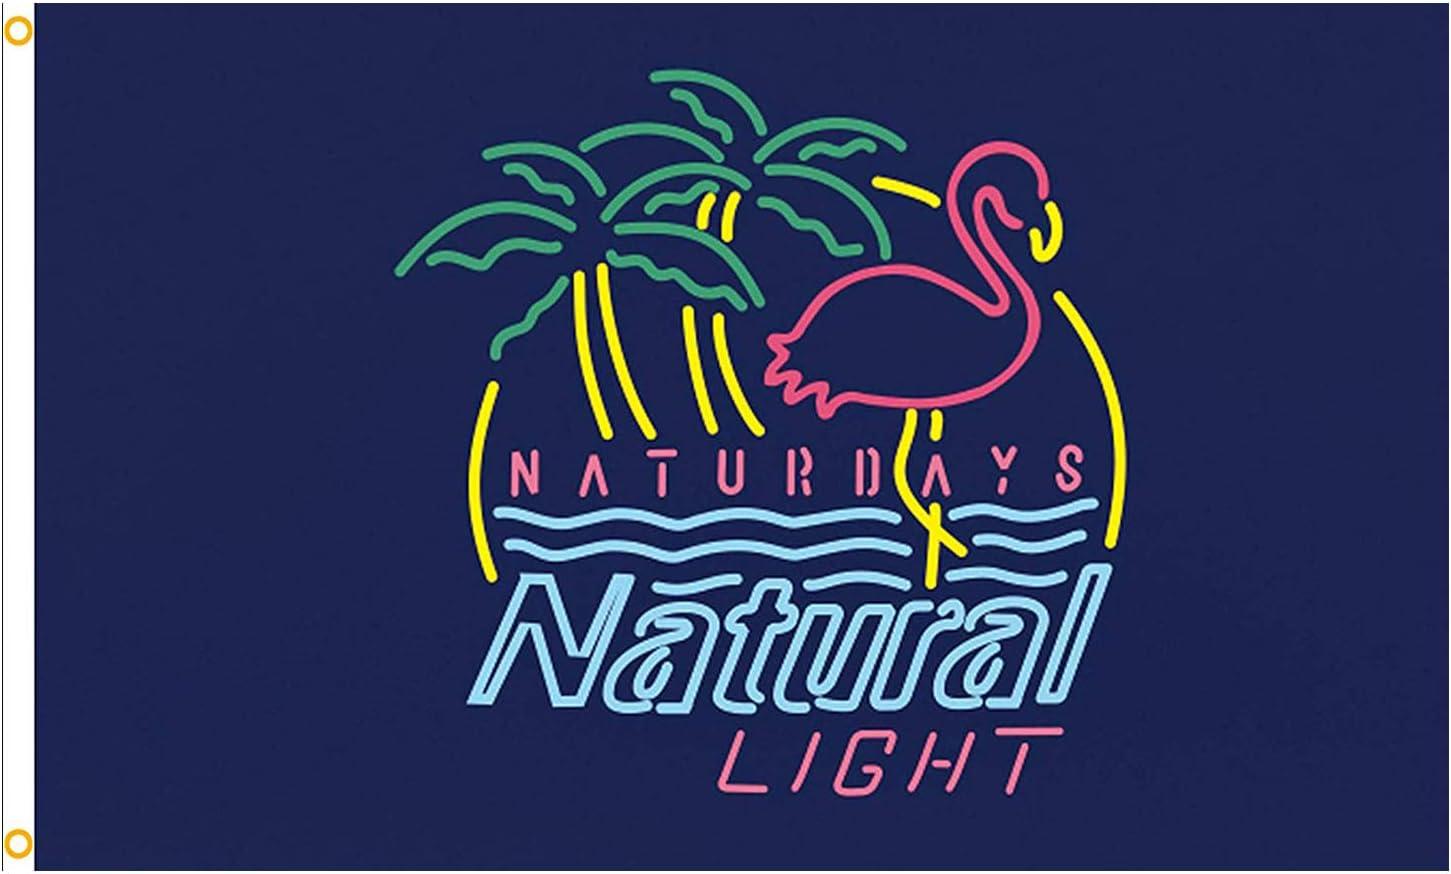 Naturdays Finally popular brand Flag Natural Light Banner Wall Man Manufacturer direct delivery Cave Beer